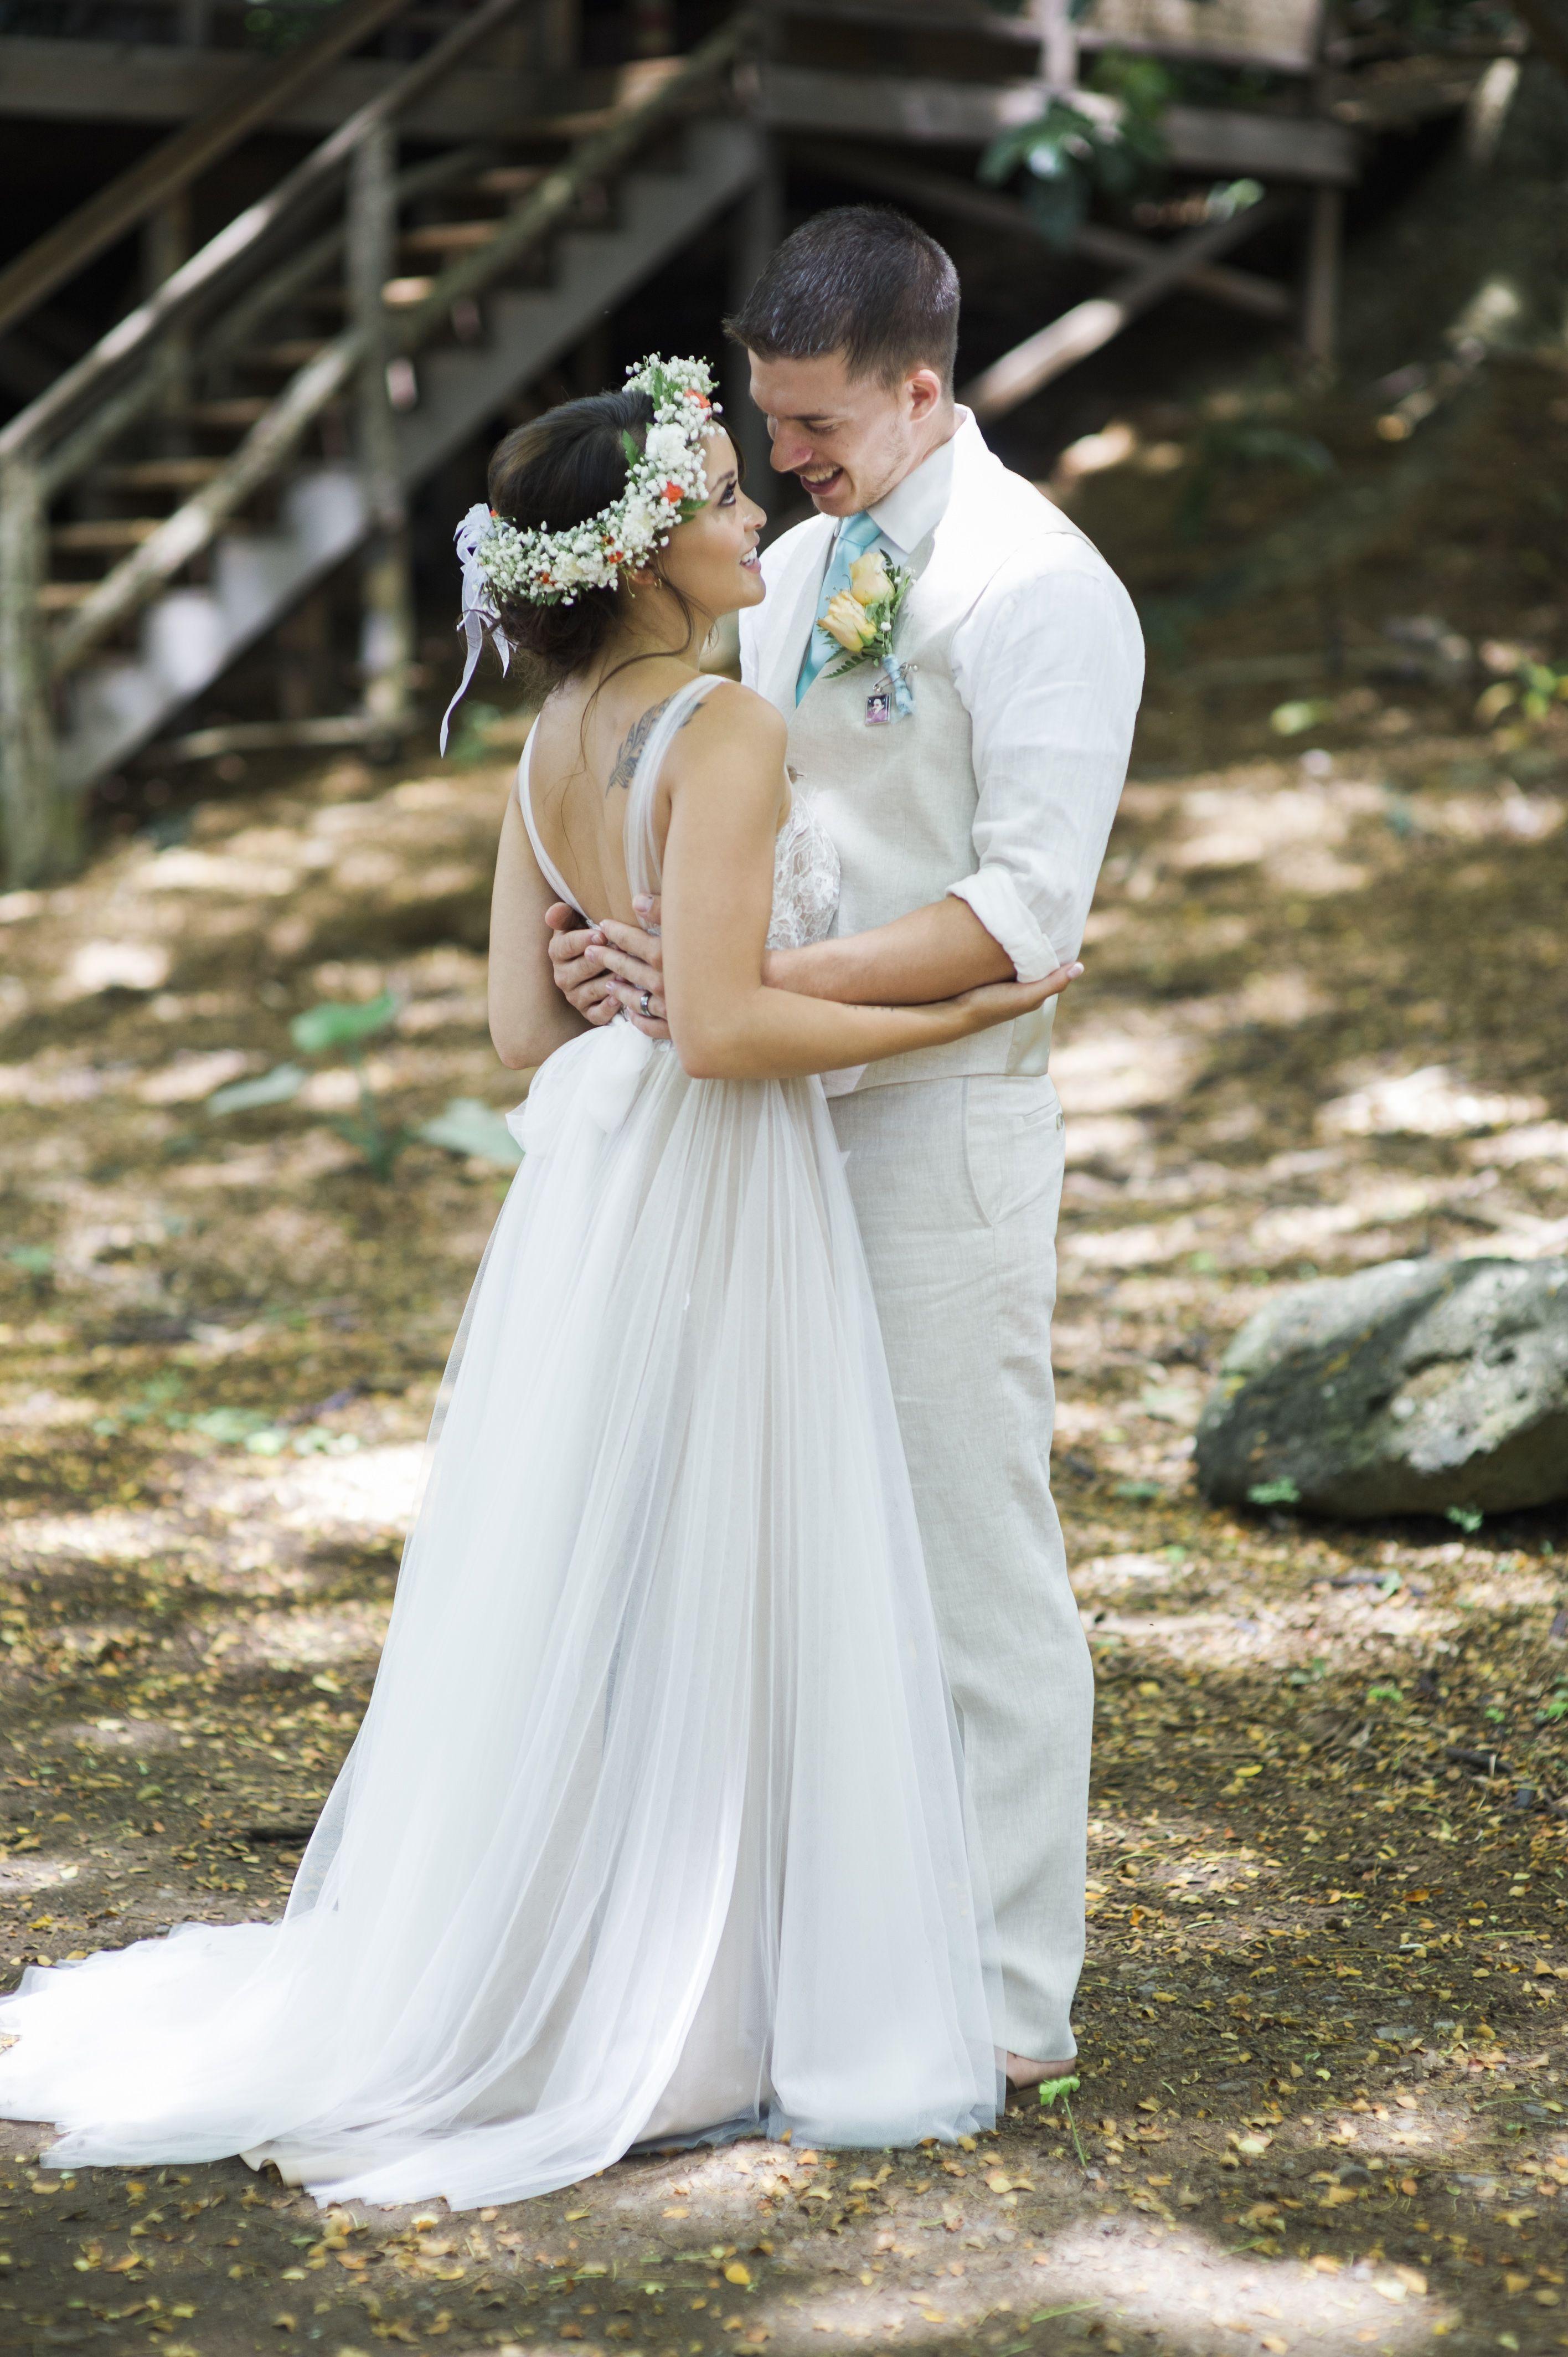 A Boho-Chic, Rustic Wedding at Kualoa Ranch in Kaneohe, Hawaii